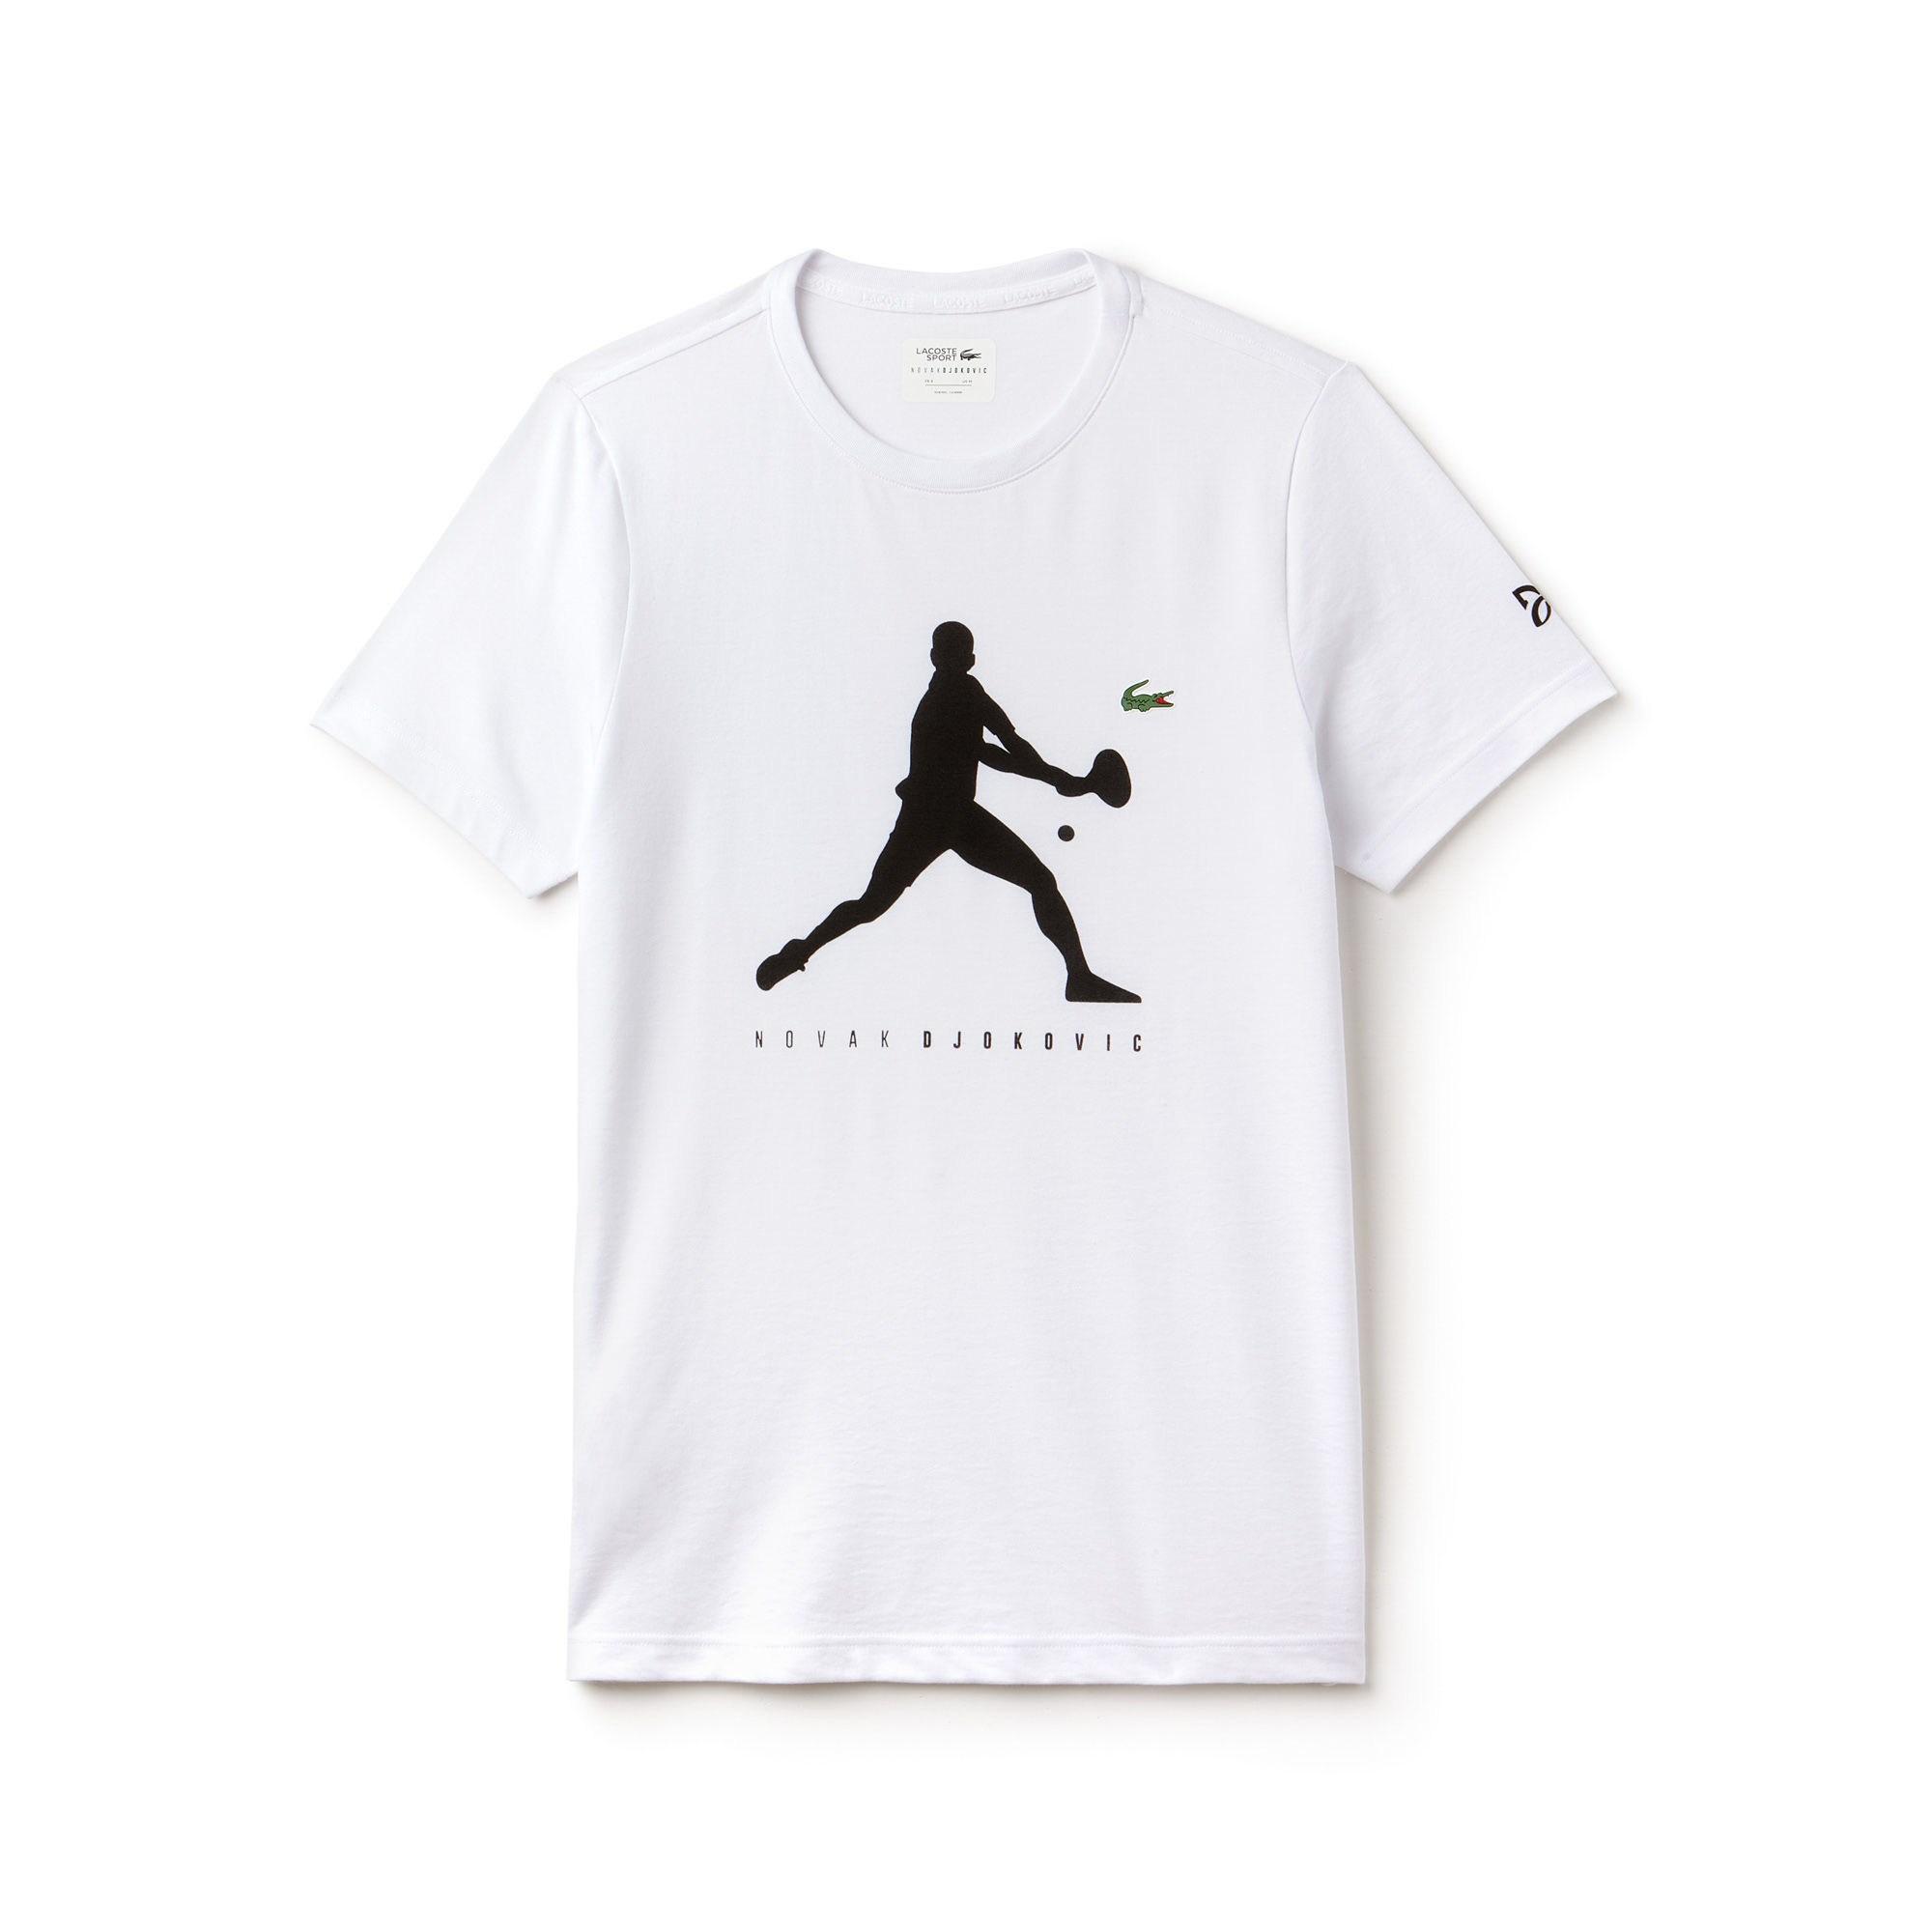 Novak Djokovic Tee Shirts 61 Off Newriversidehotel Com